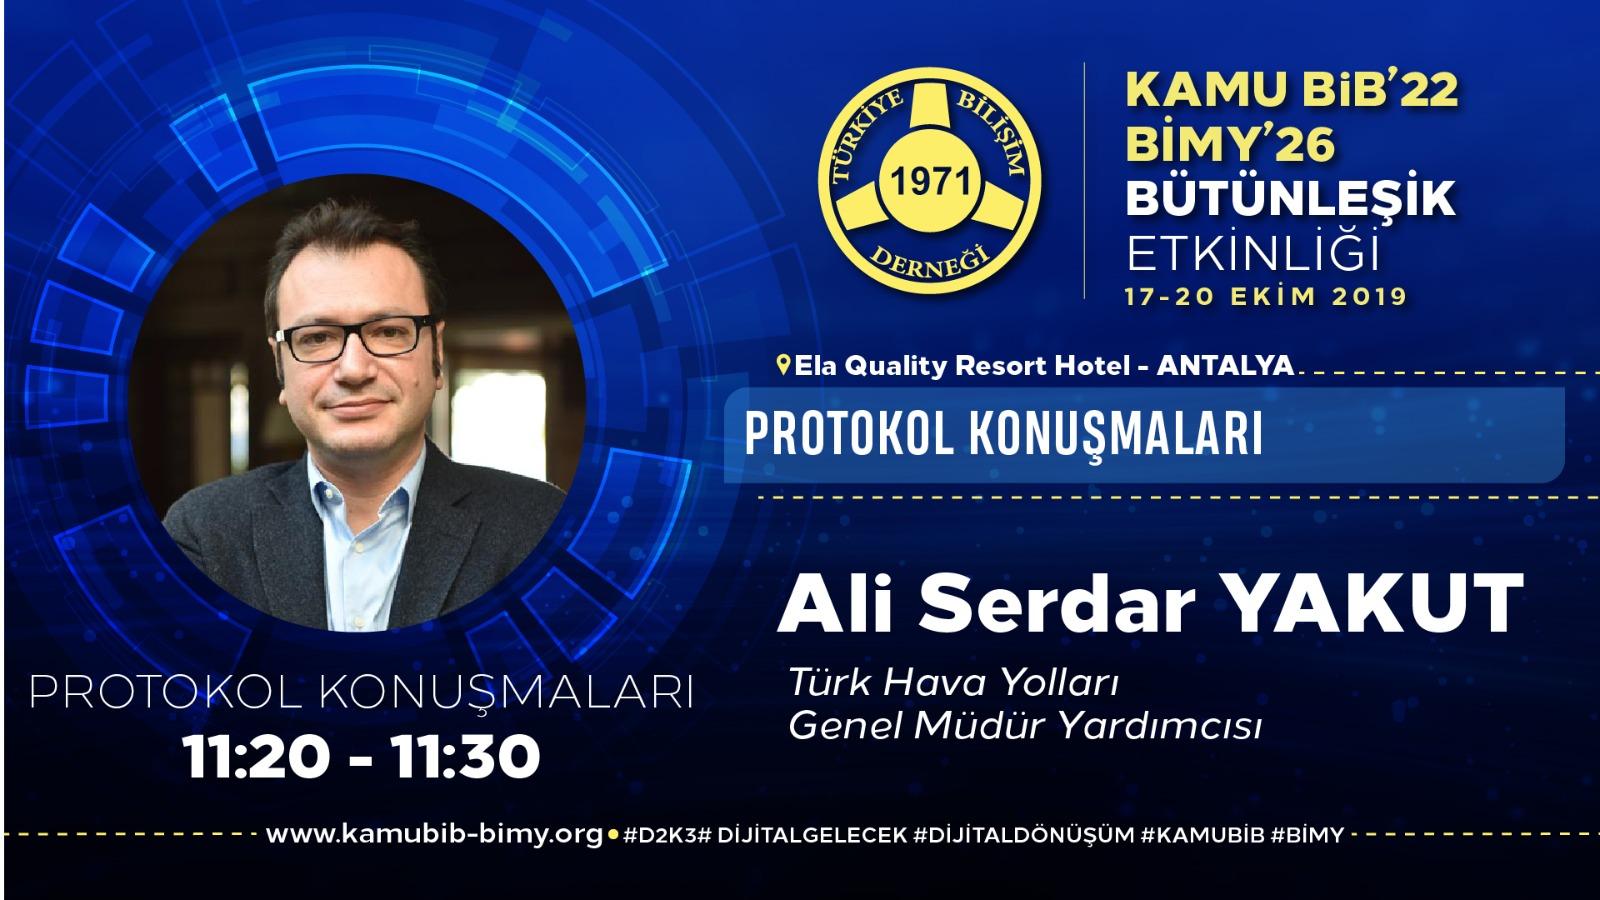 Ali Serdar YAKUT - KamuBİB'22 BİMY'26